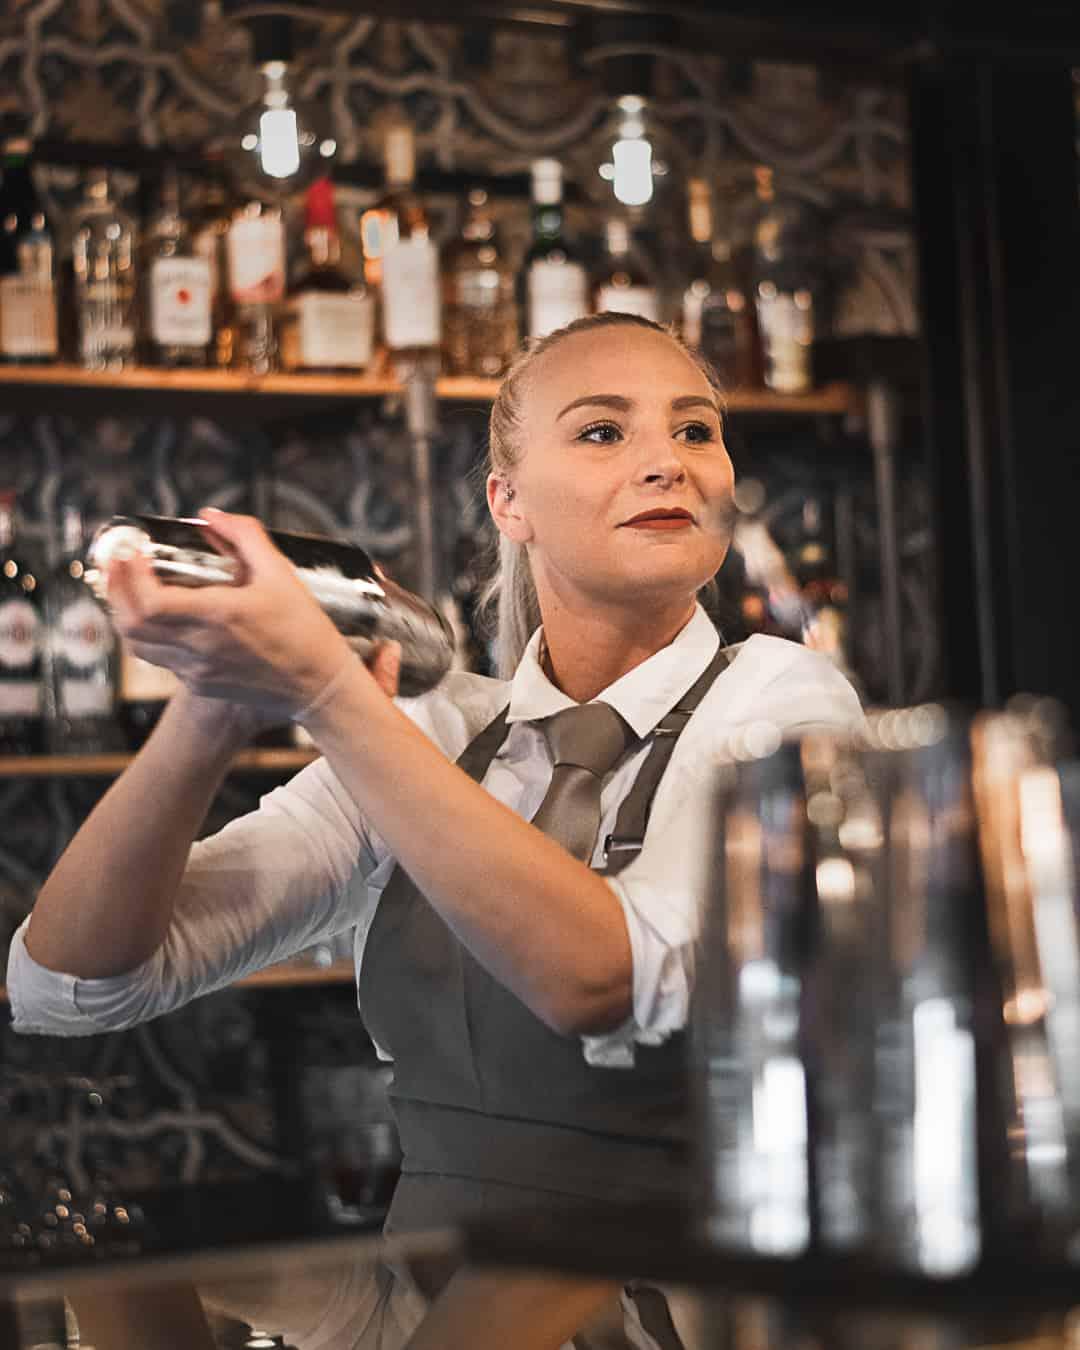 Blackstone Steakhouse drinkar